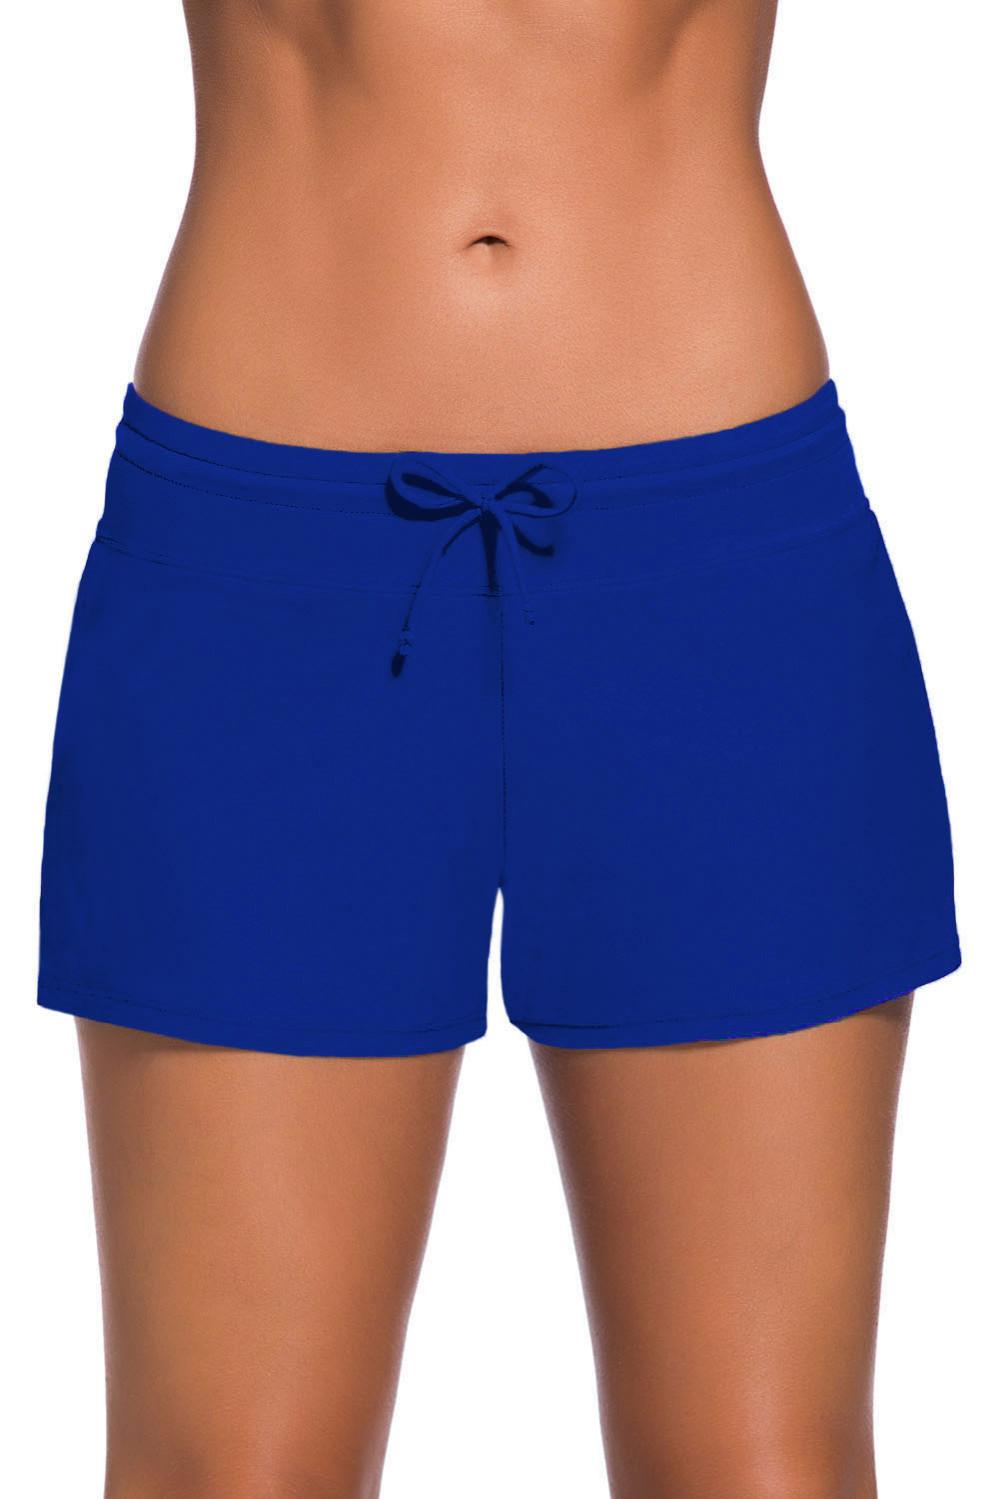 Royal-Blue-Women-Swim-Boardshort-LC41977-5-1